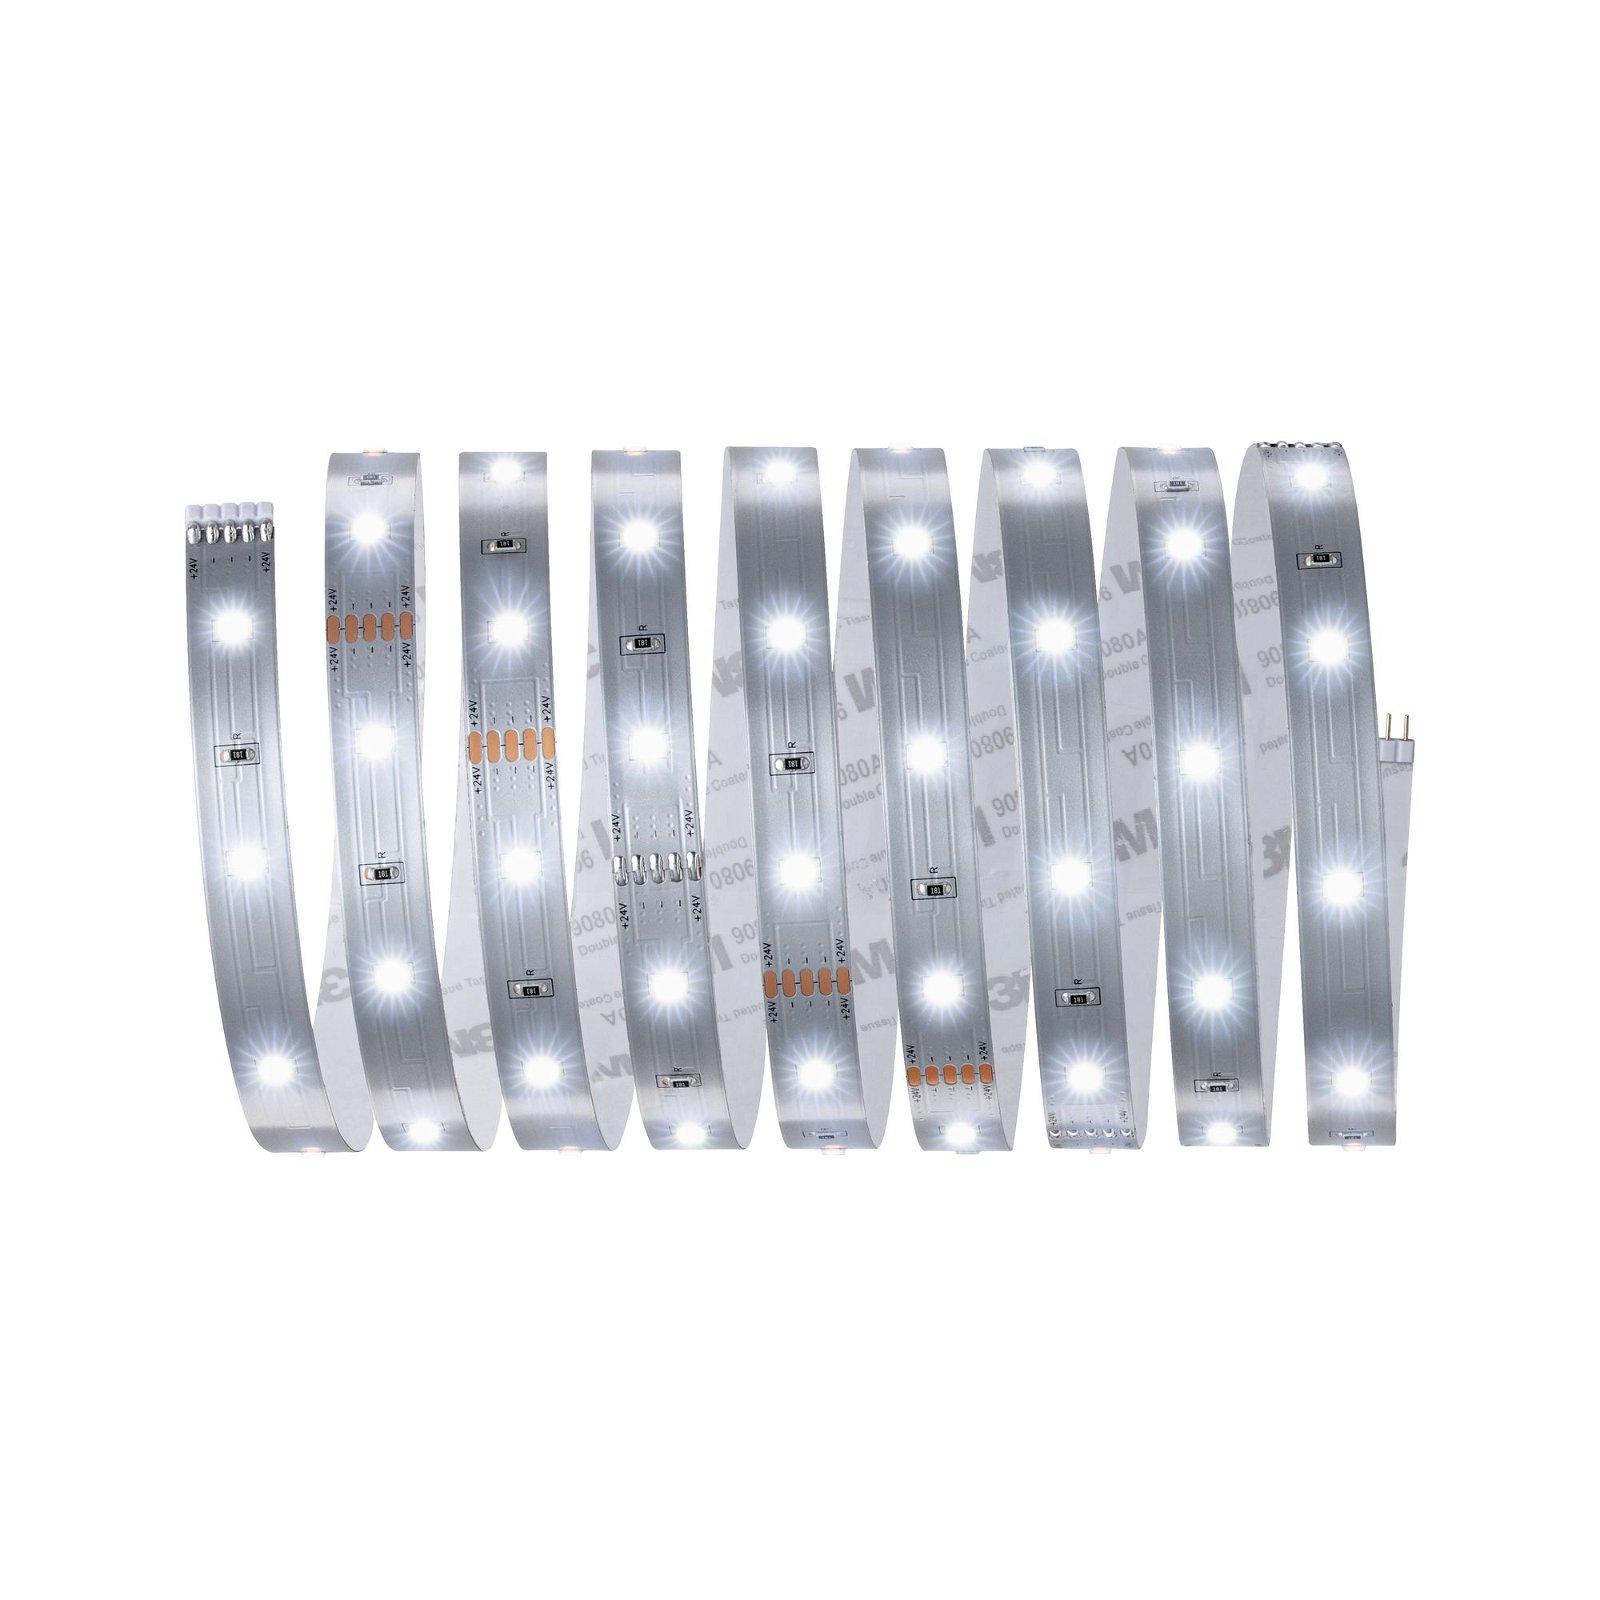 MaxLED 250 LED Strip Daglichtwit 2,5m 10W 750lm 6500K